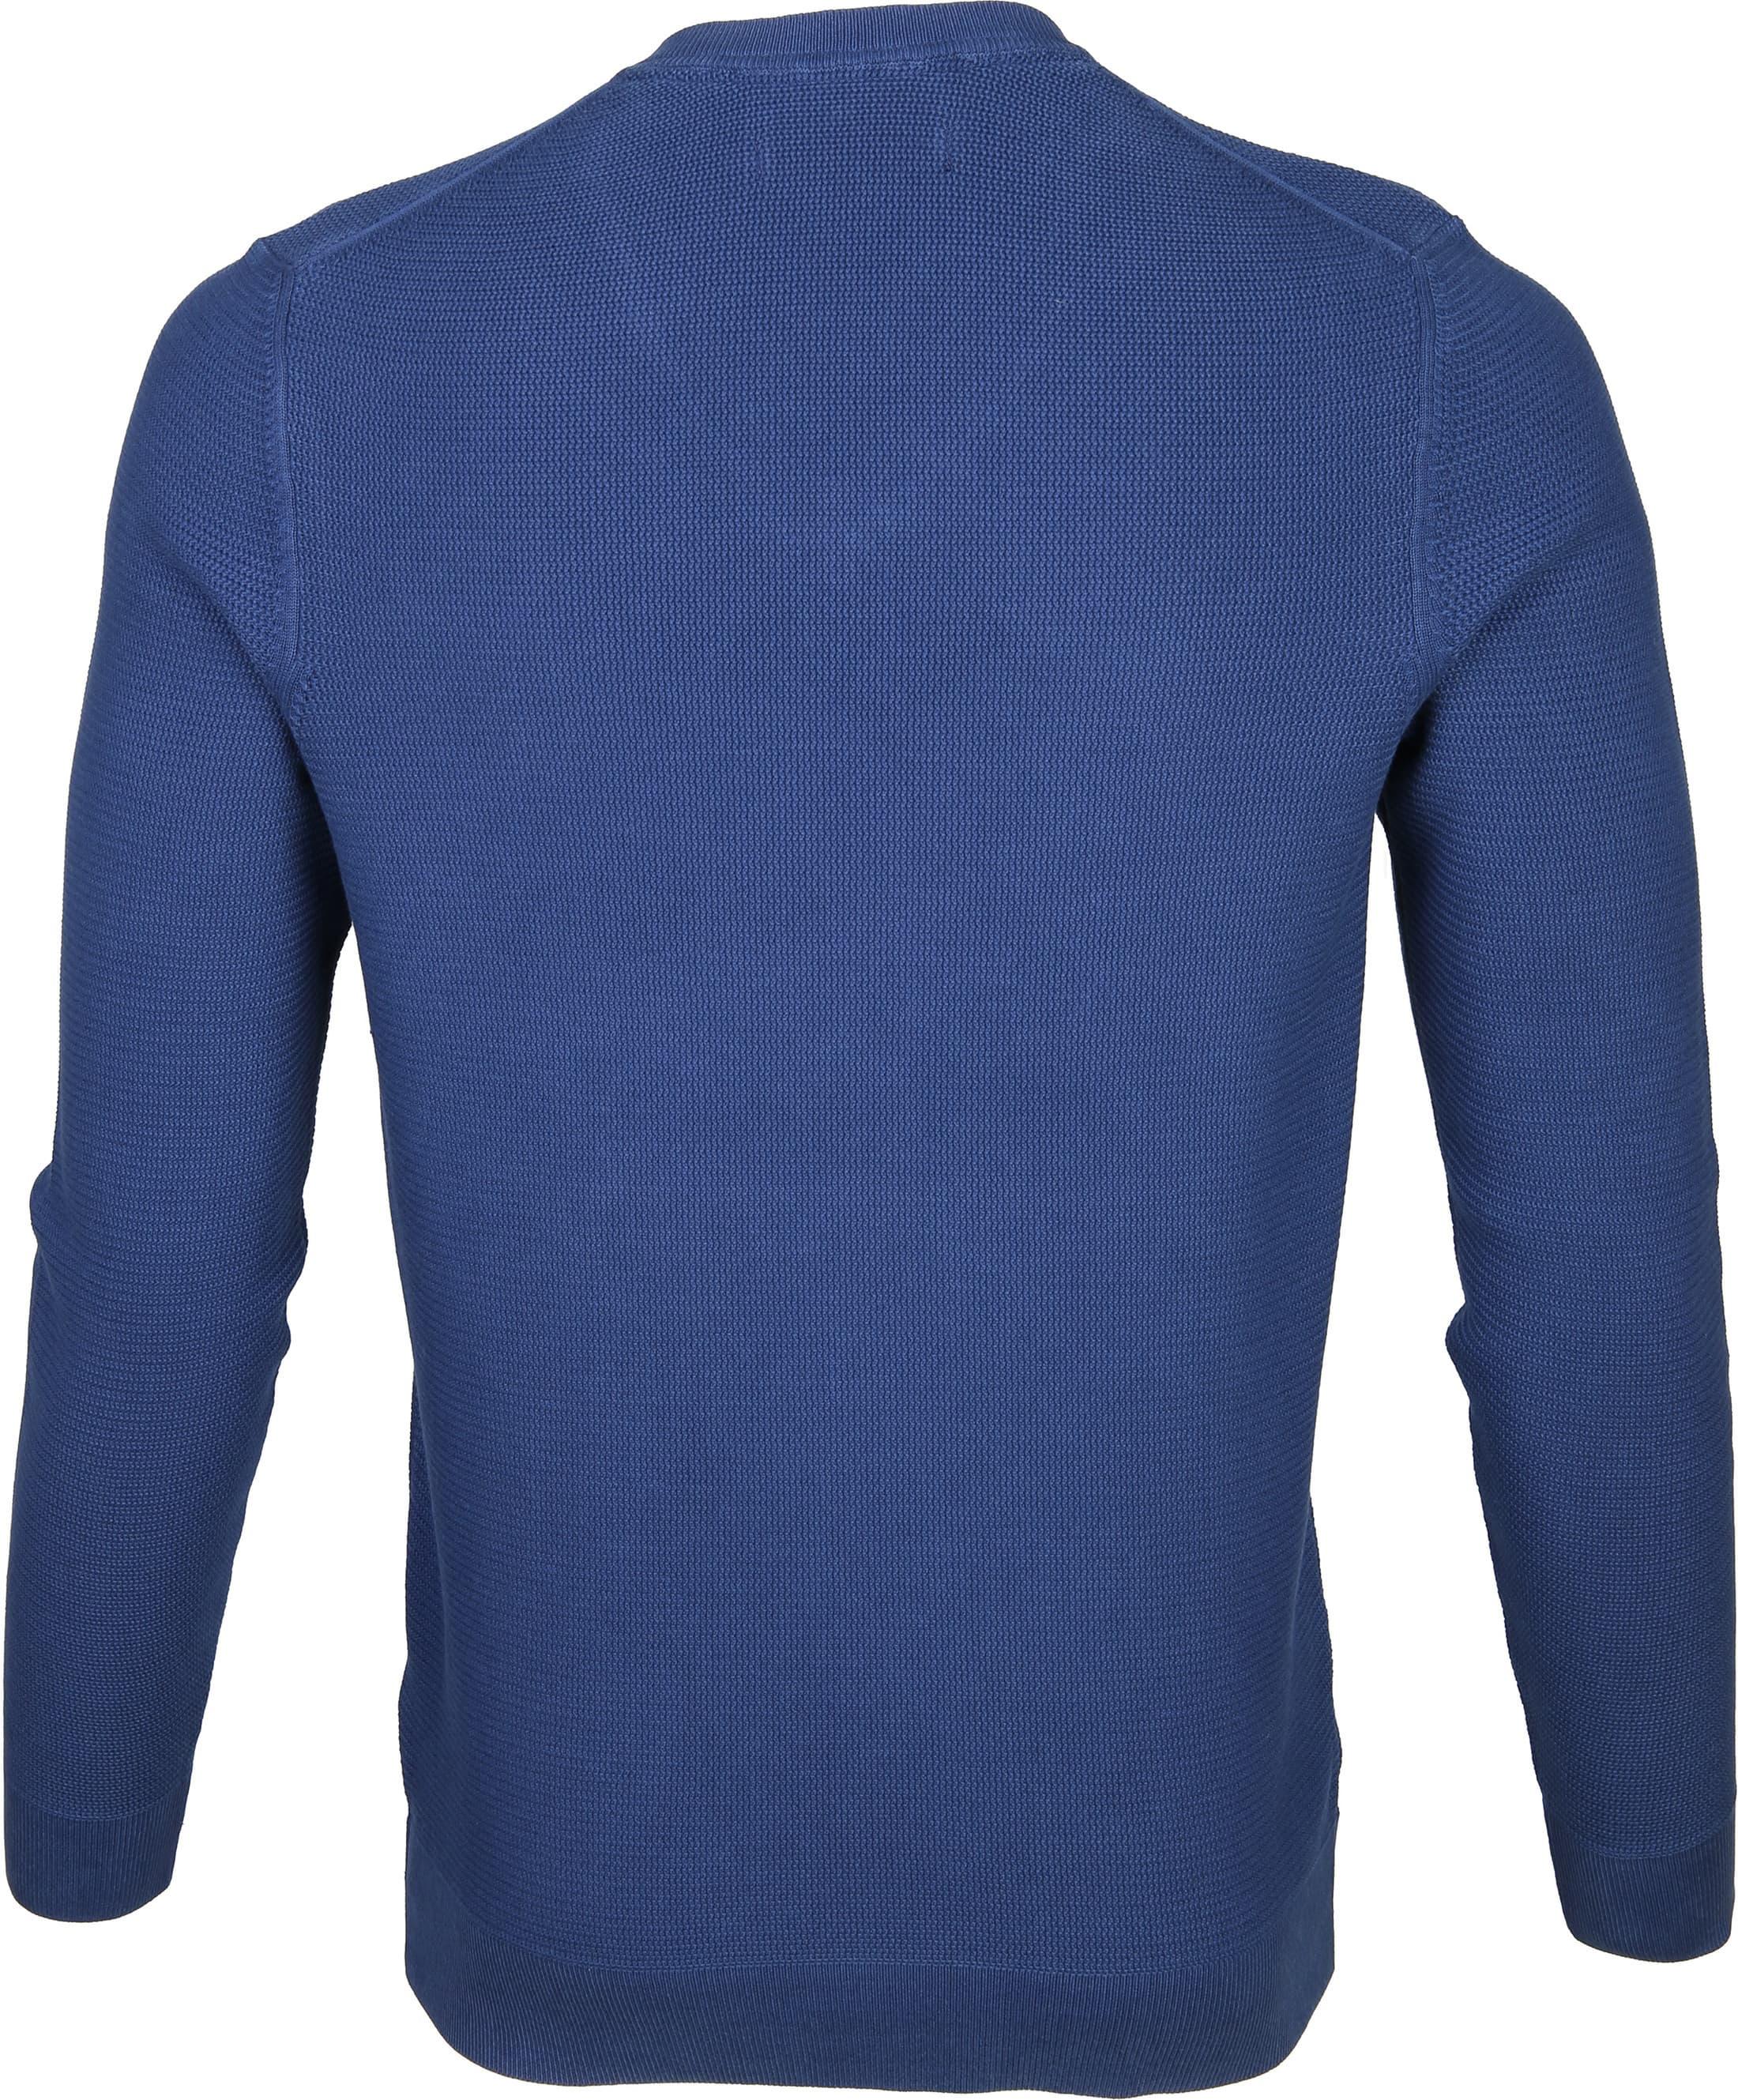 Marc O'Polo Pullover Blauw Katoen foto 2